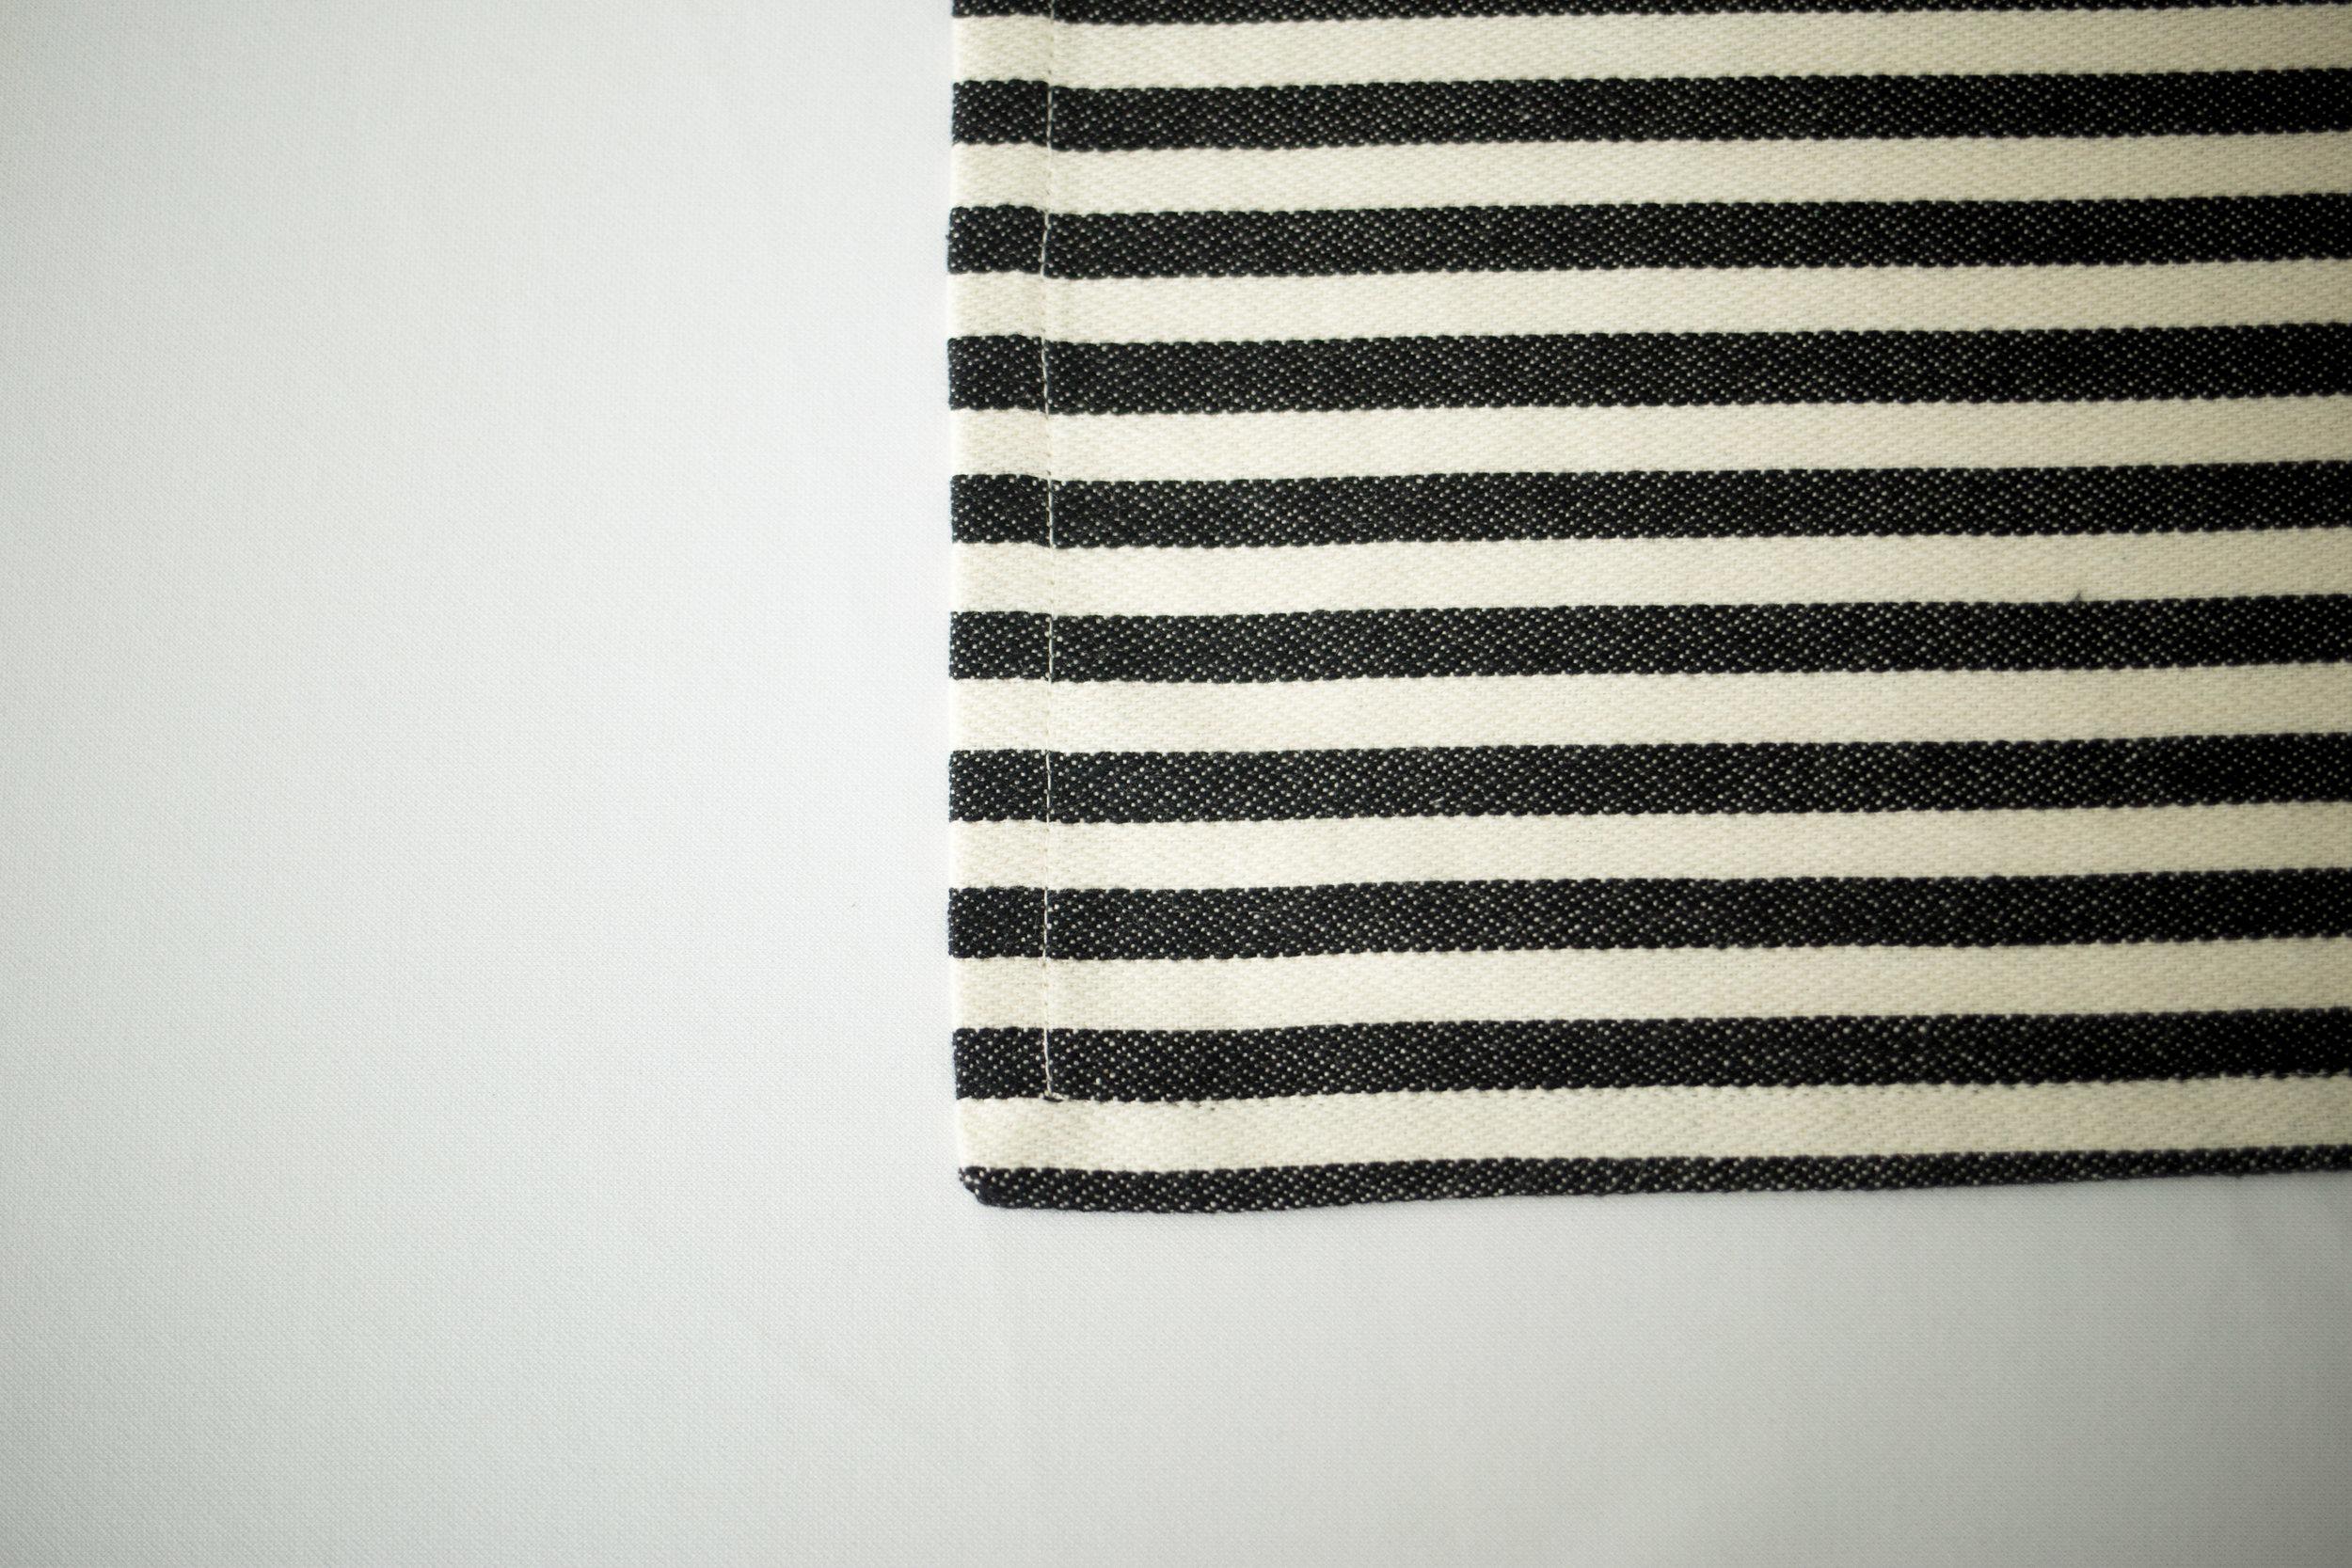 IMG_5114.jpg classic stripe napkin.jpg